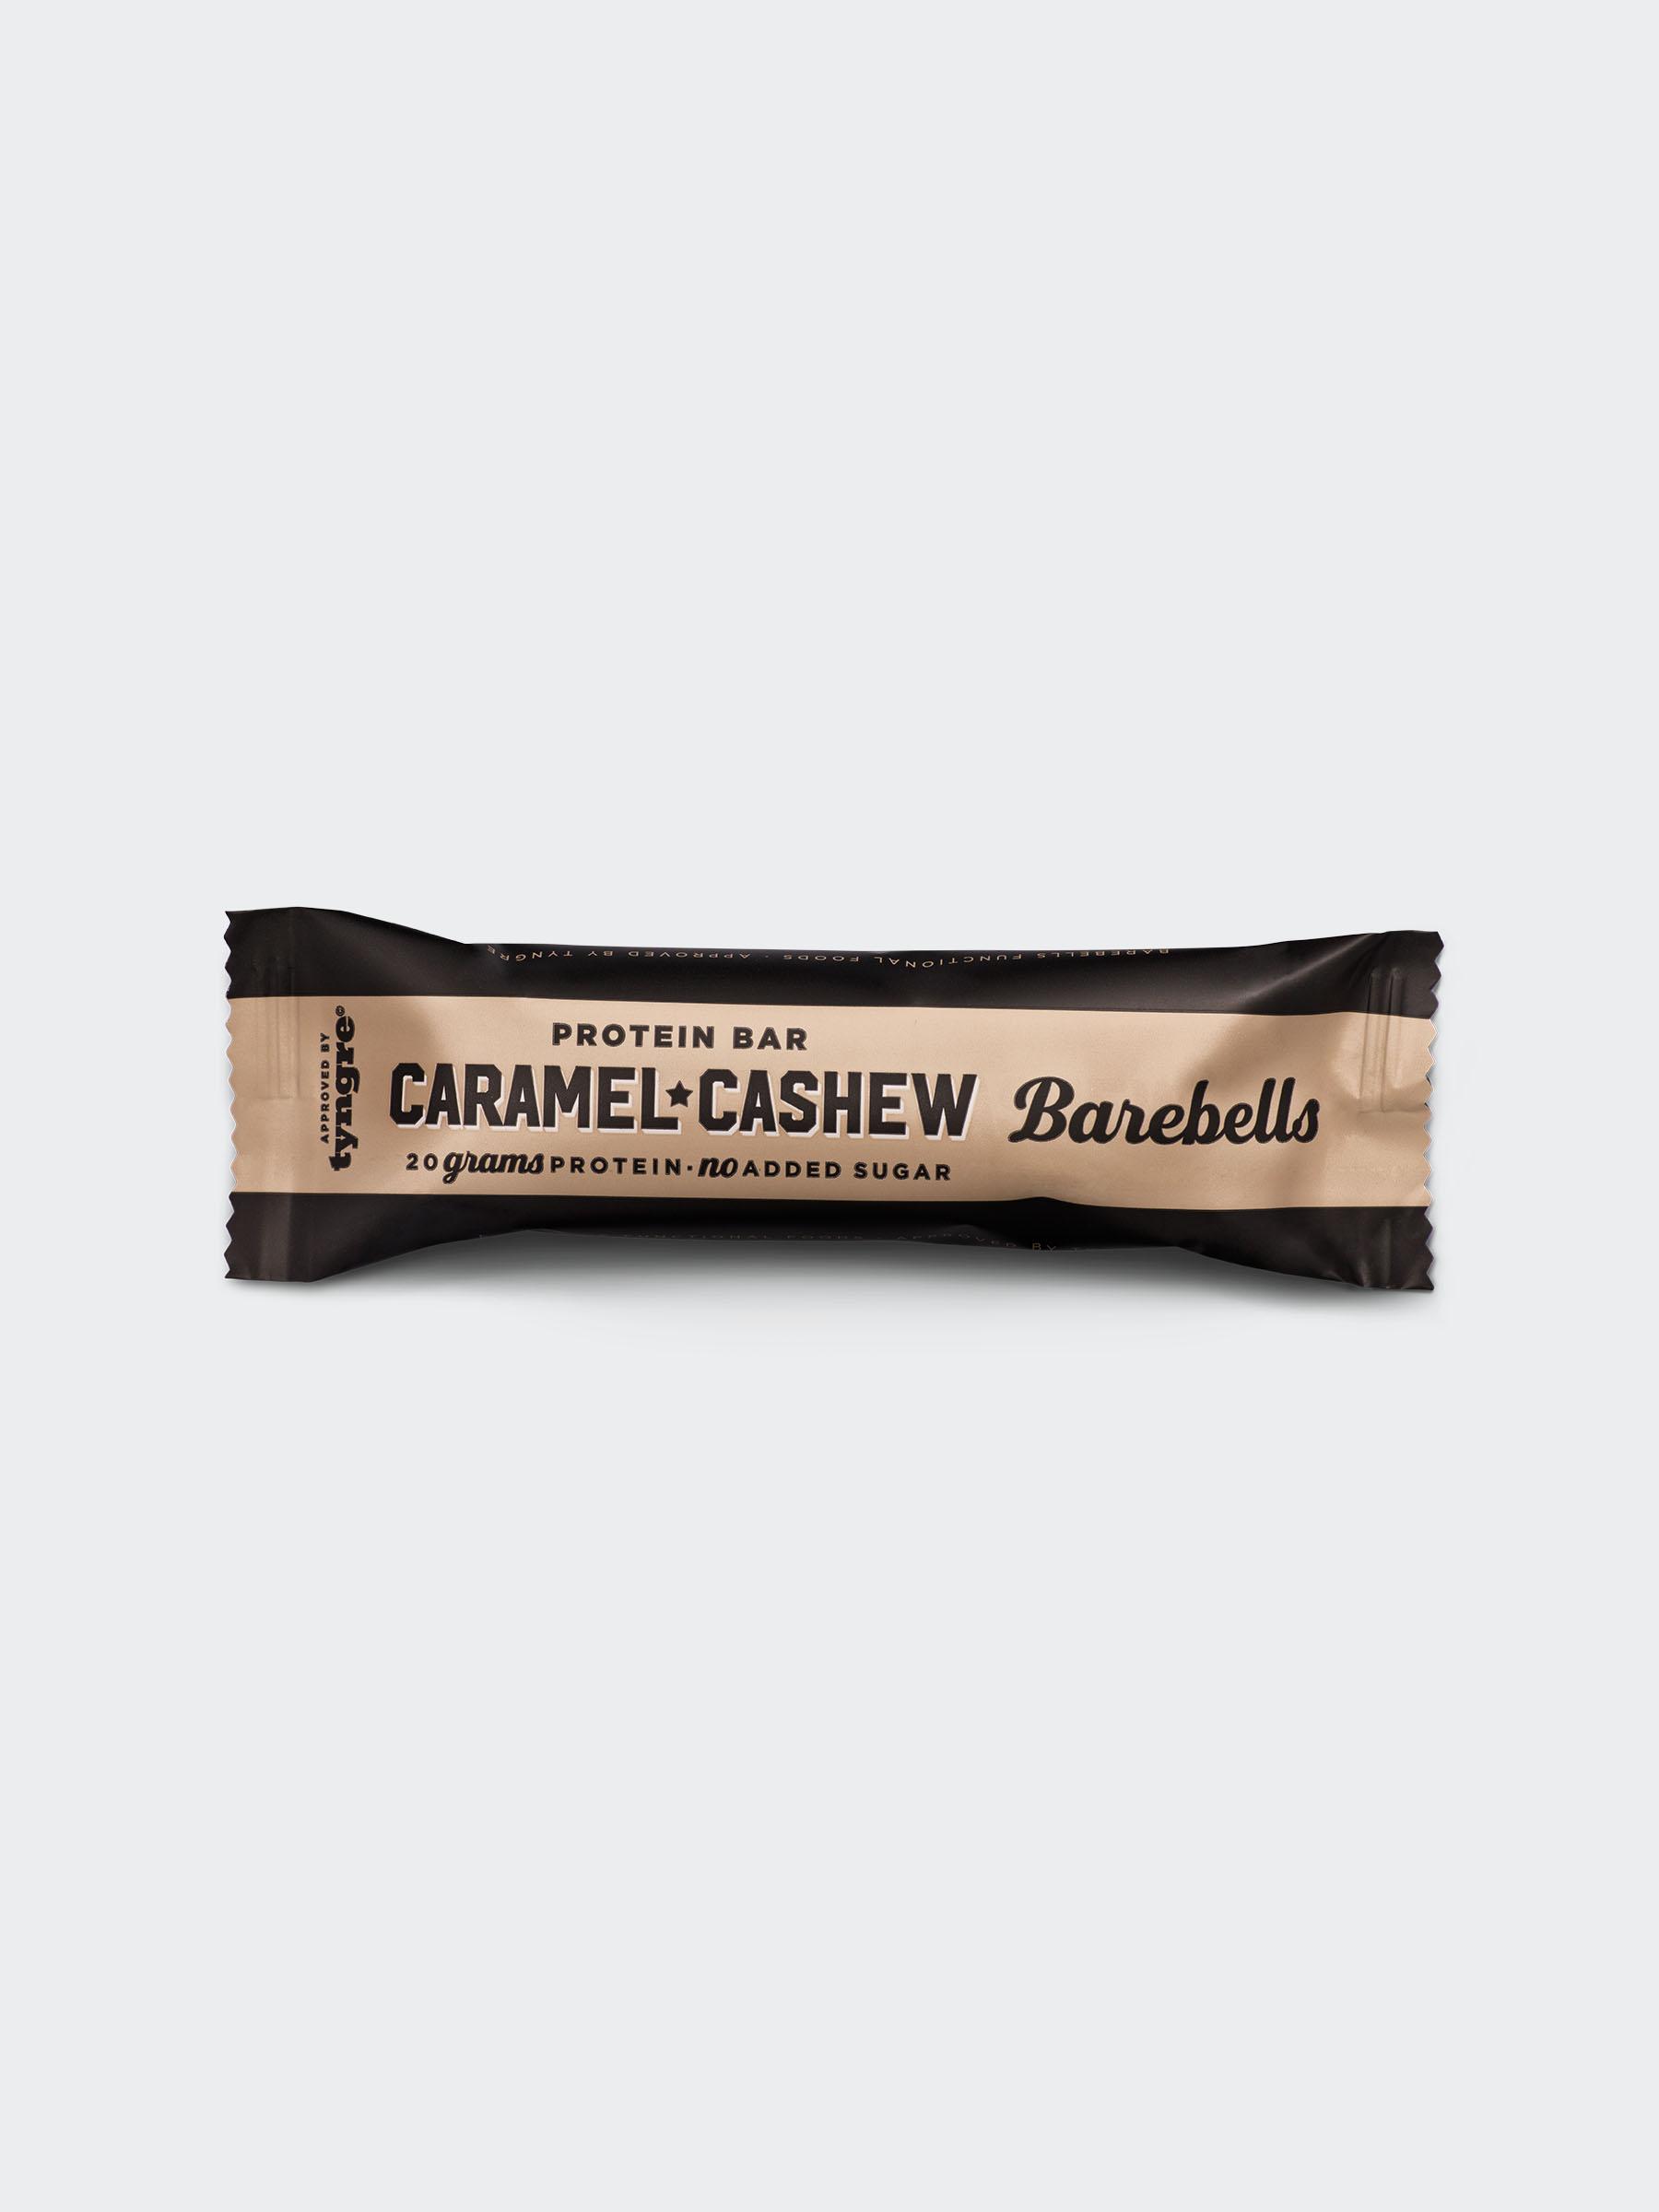 Barebells Caramel-Cashew